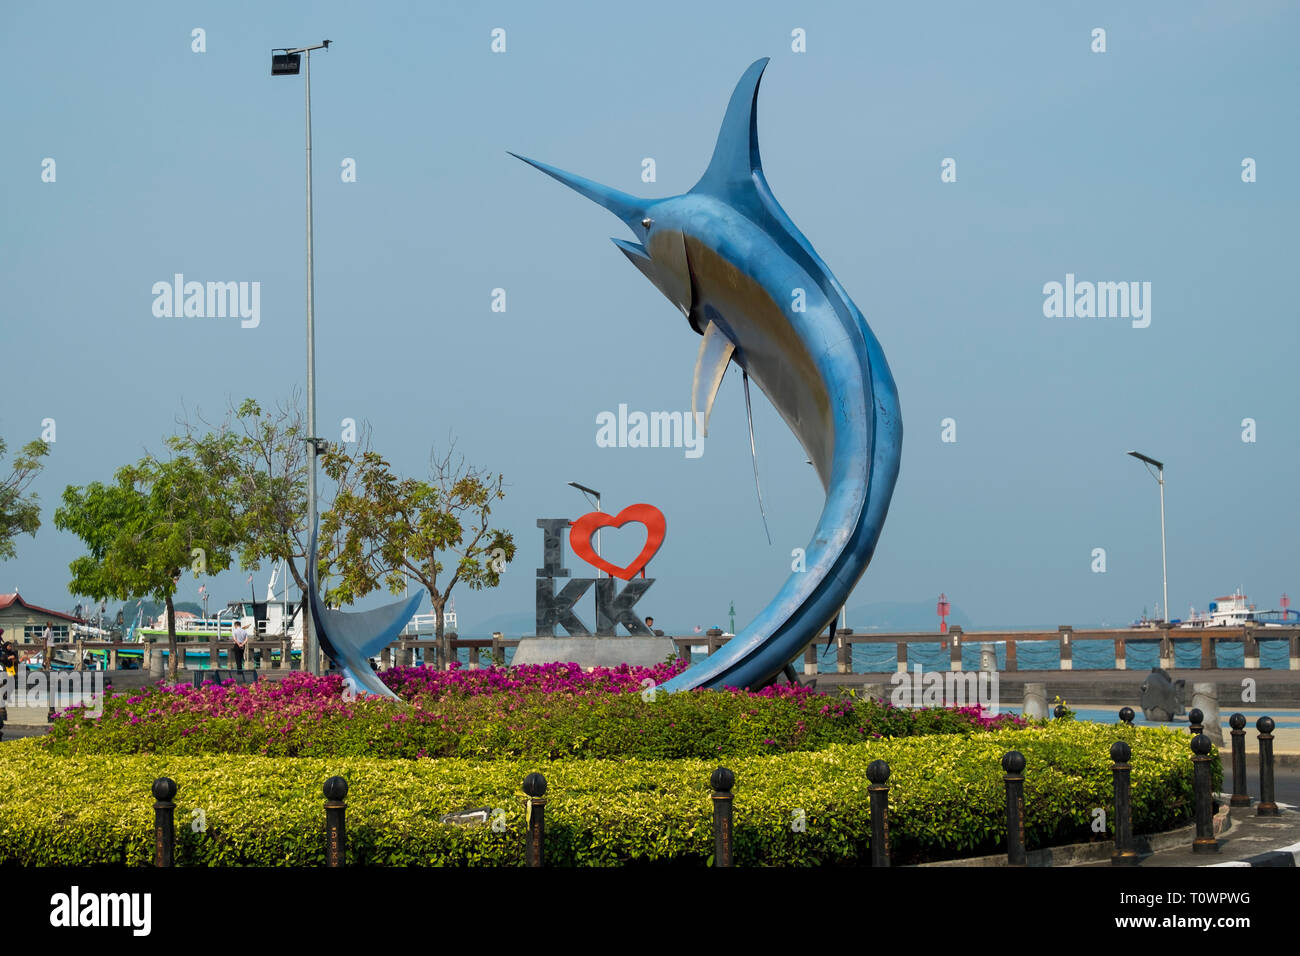 A big marlin statue marks one of the main roundabouts in Kota Kinabalu, Sabah, Borneo, Malaysia. - Stock Image